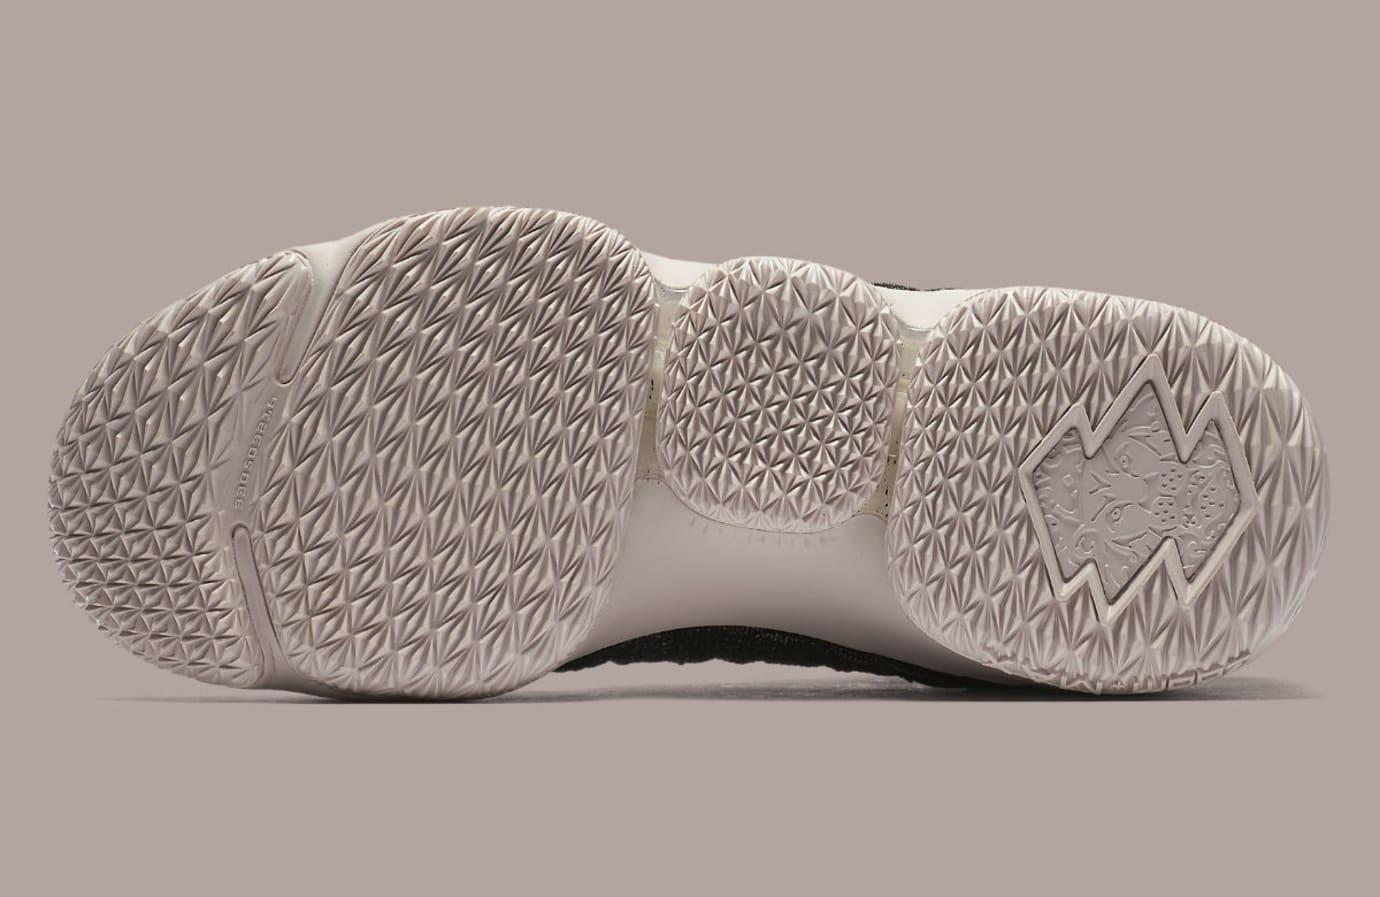 Nike LeBron 15 Pride of Ohio Release date 897648-003 Sole